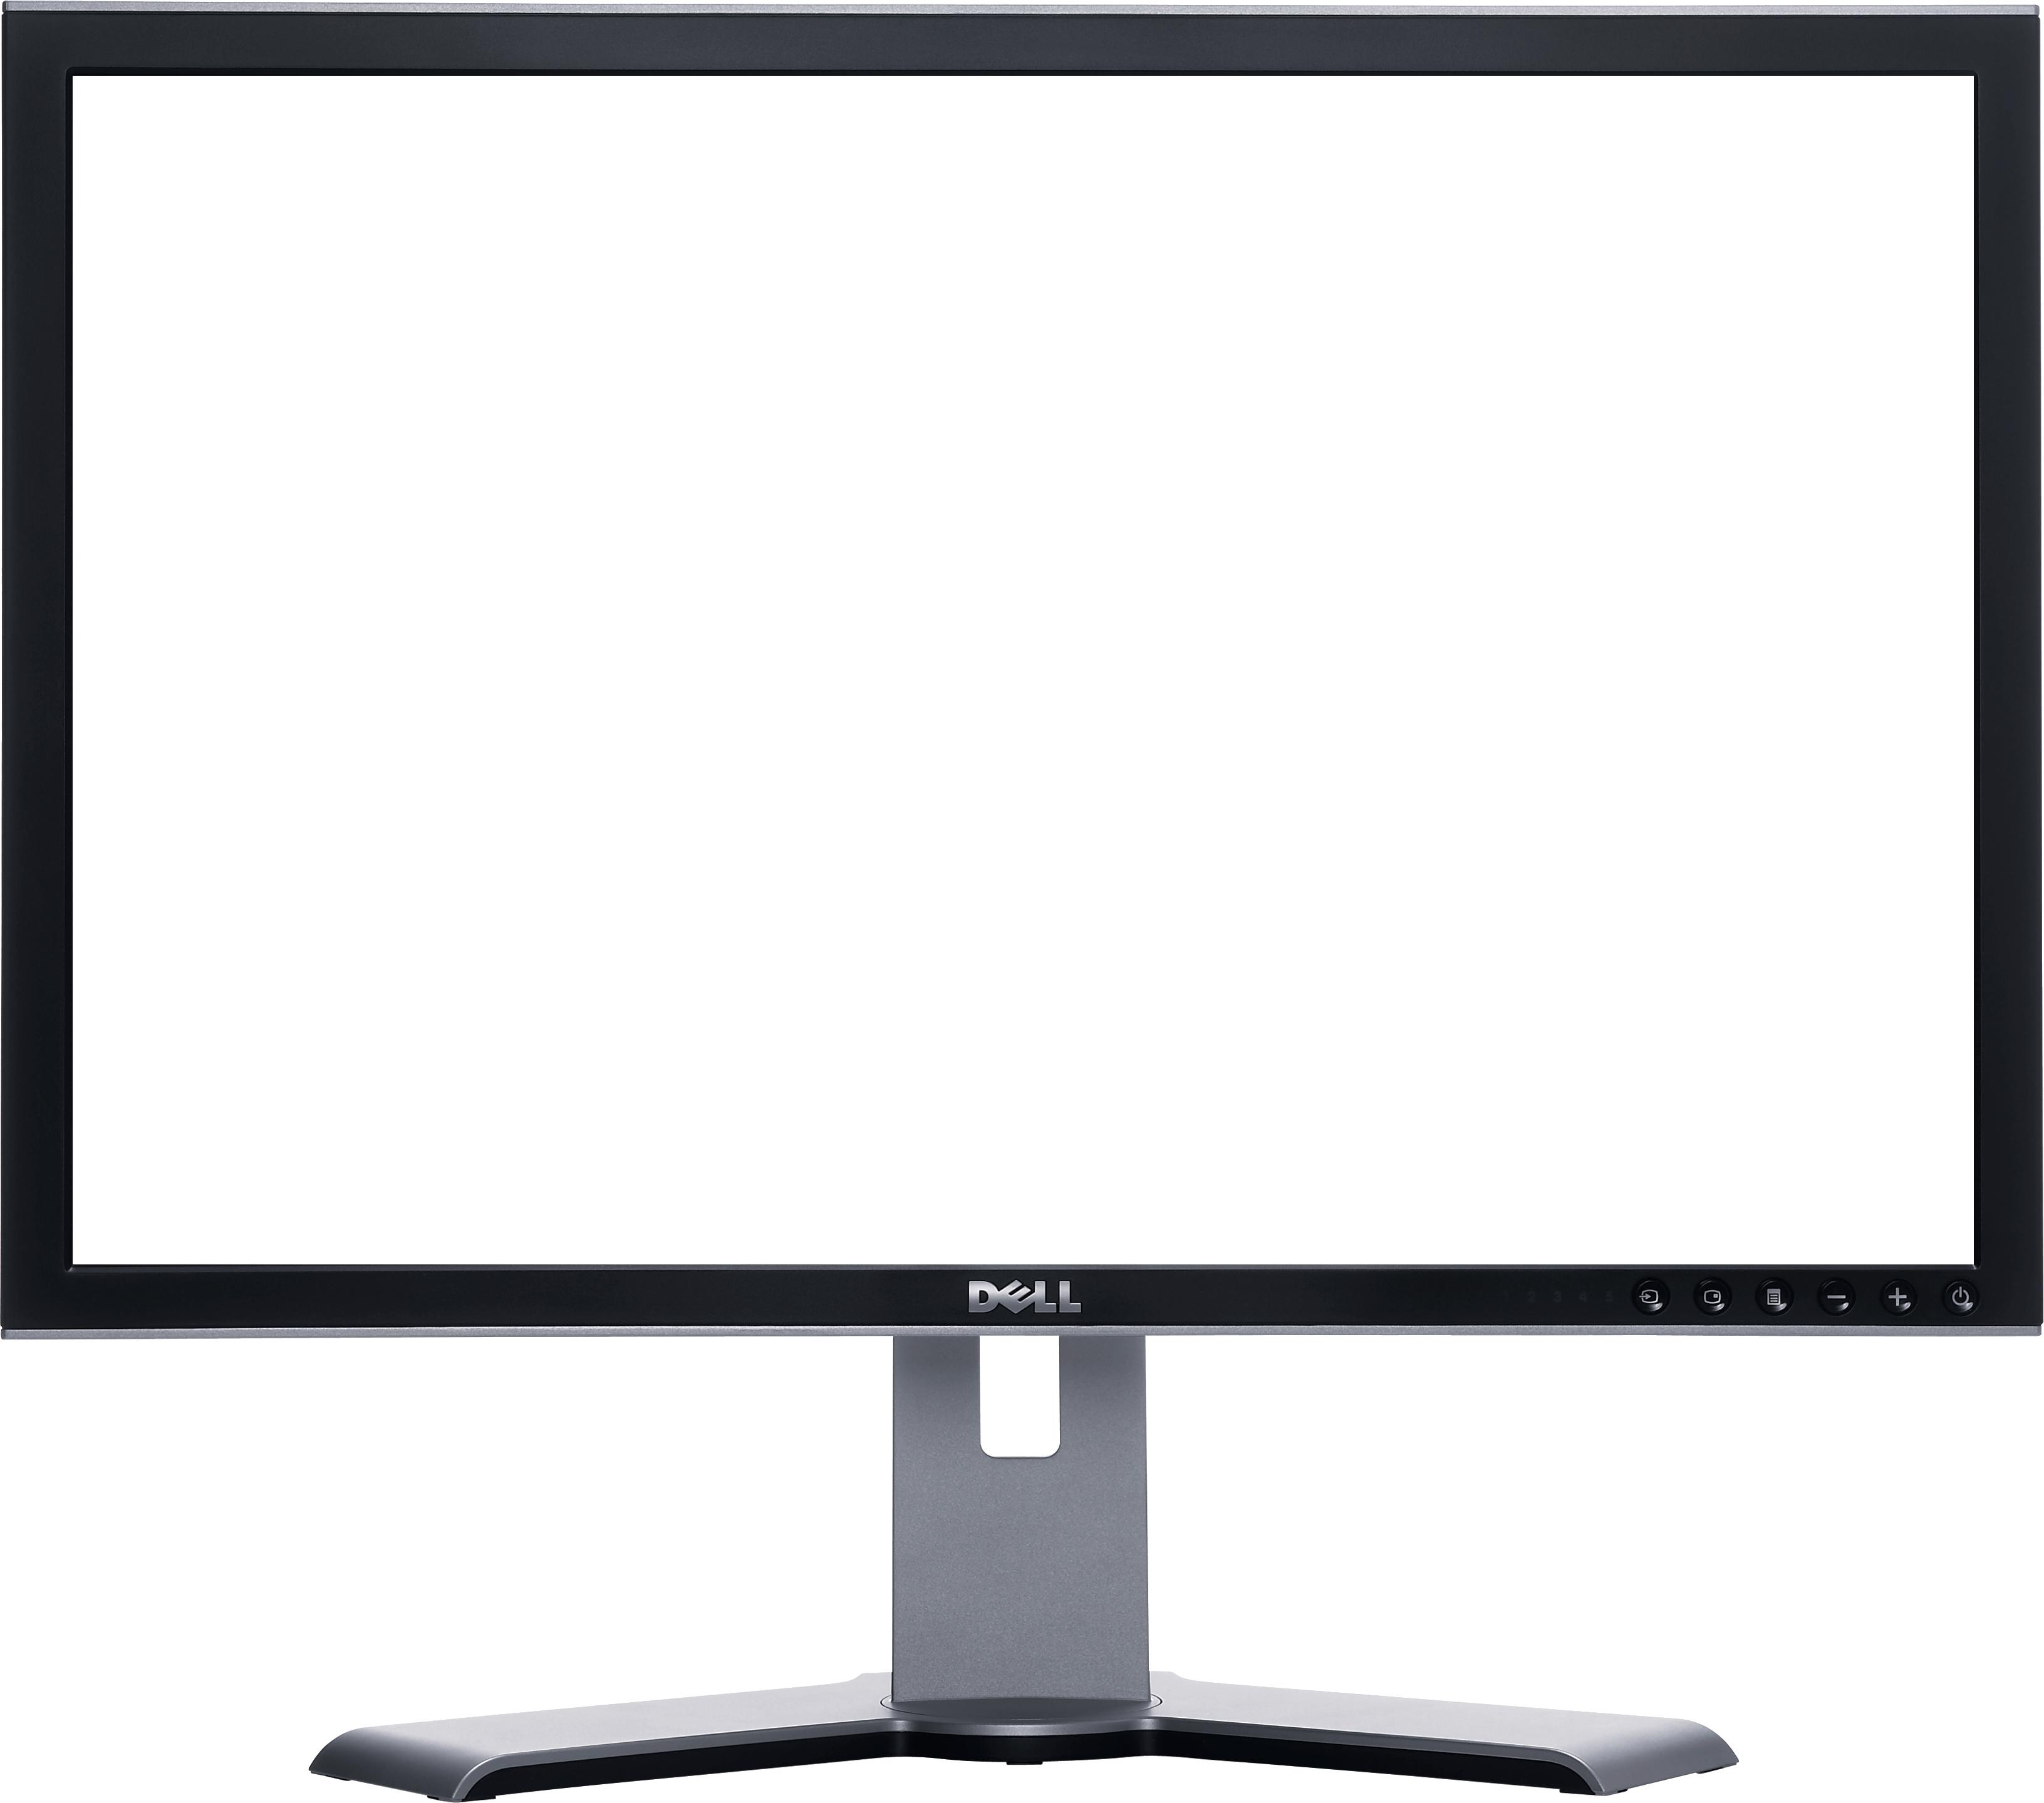 Computer save clipart translucent jpg royalty free Computer clipart transparent background - ClipartFox jpg royalty free